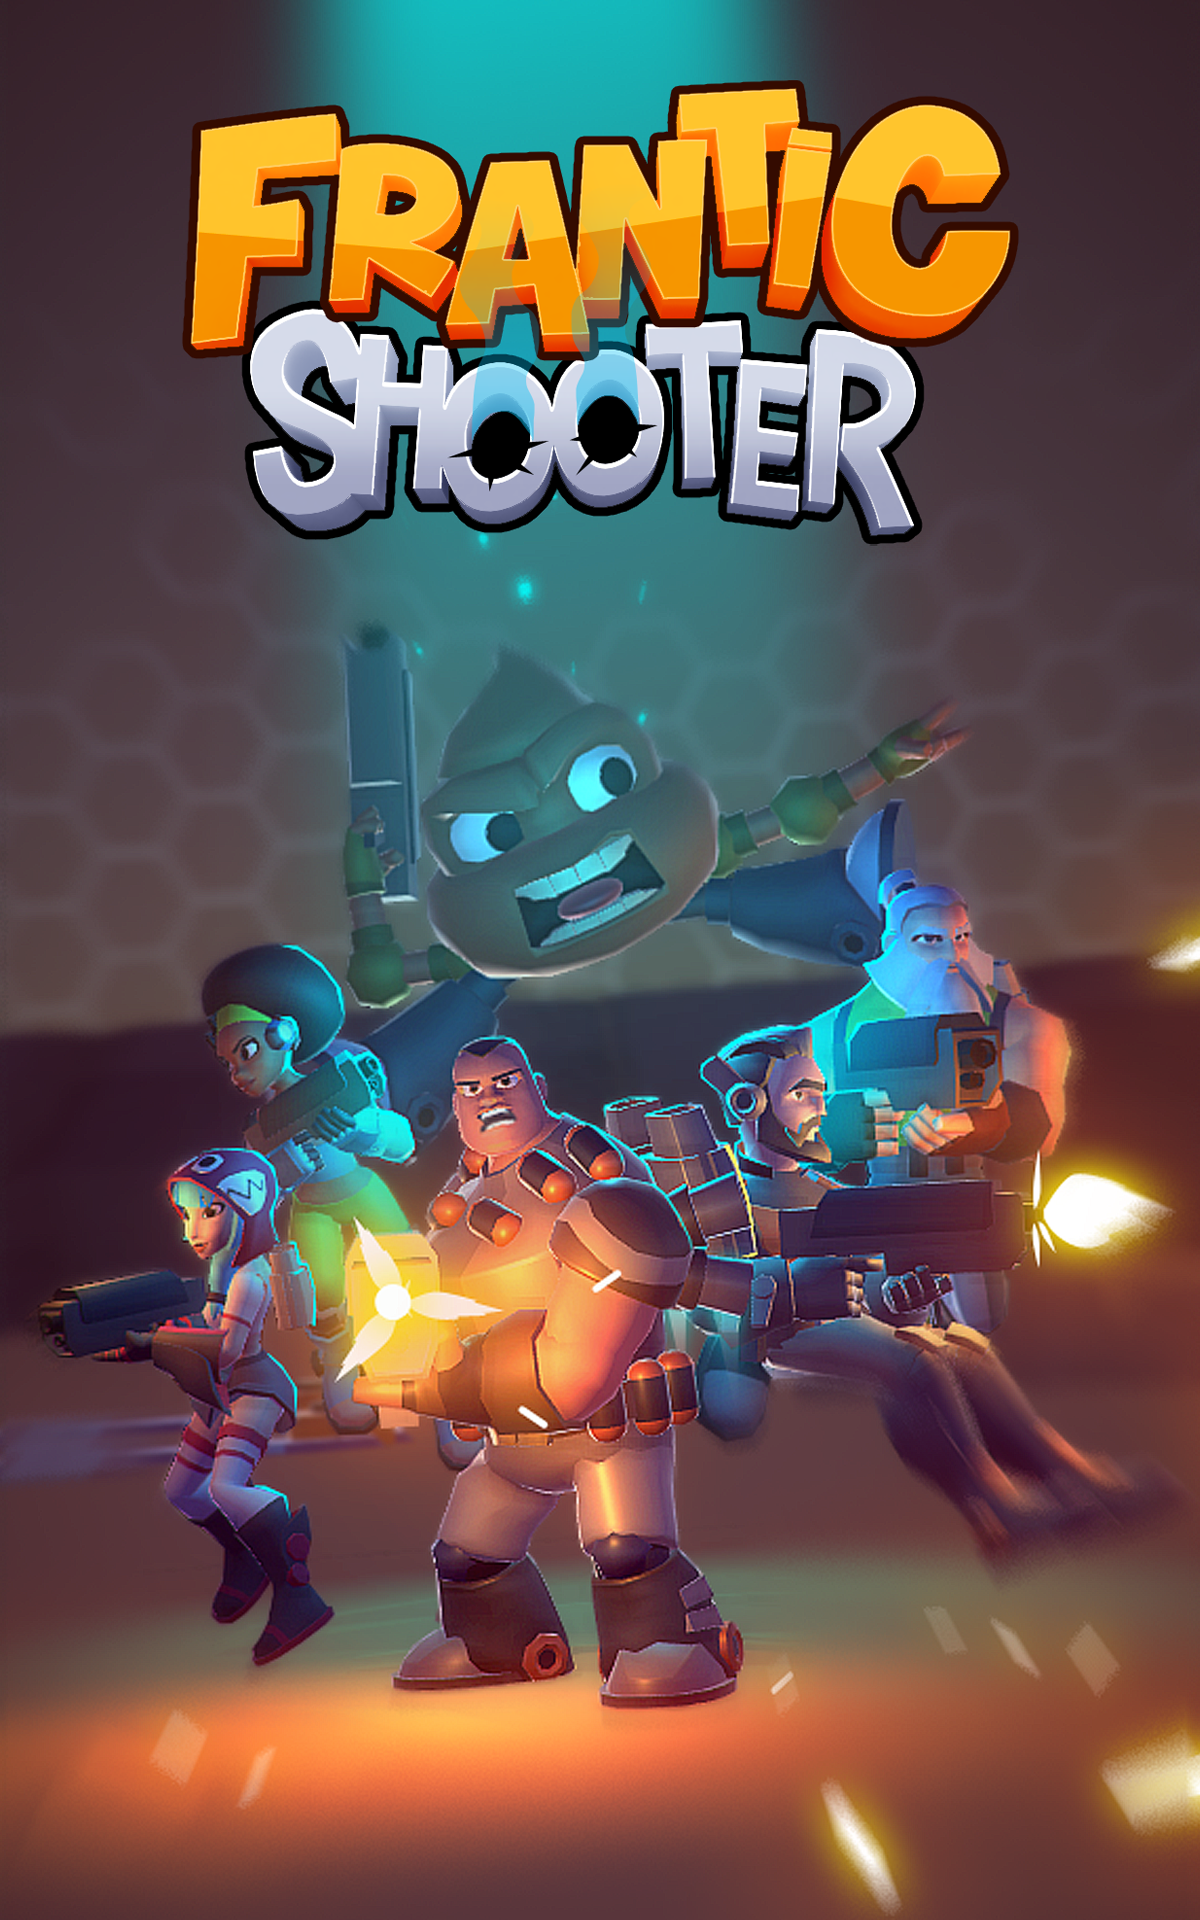 Frantic Shooter screenshot #11